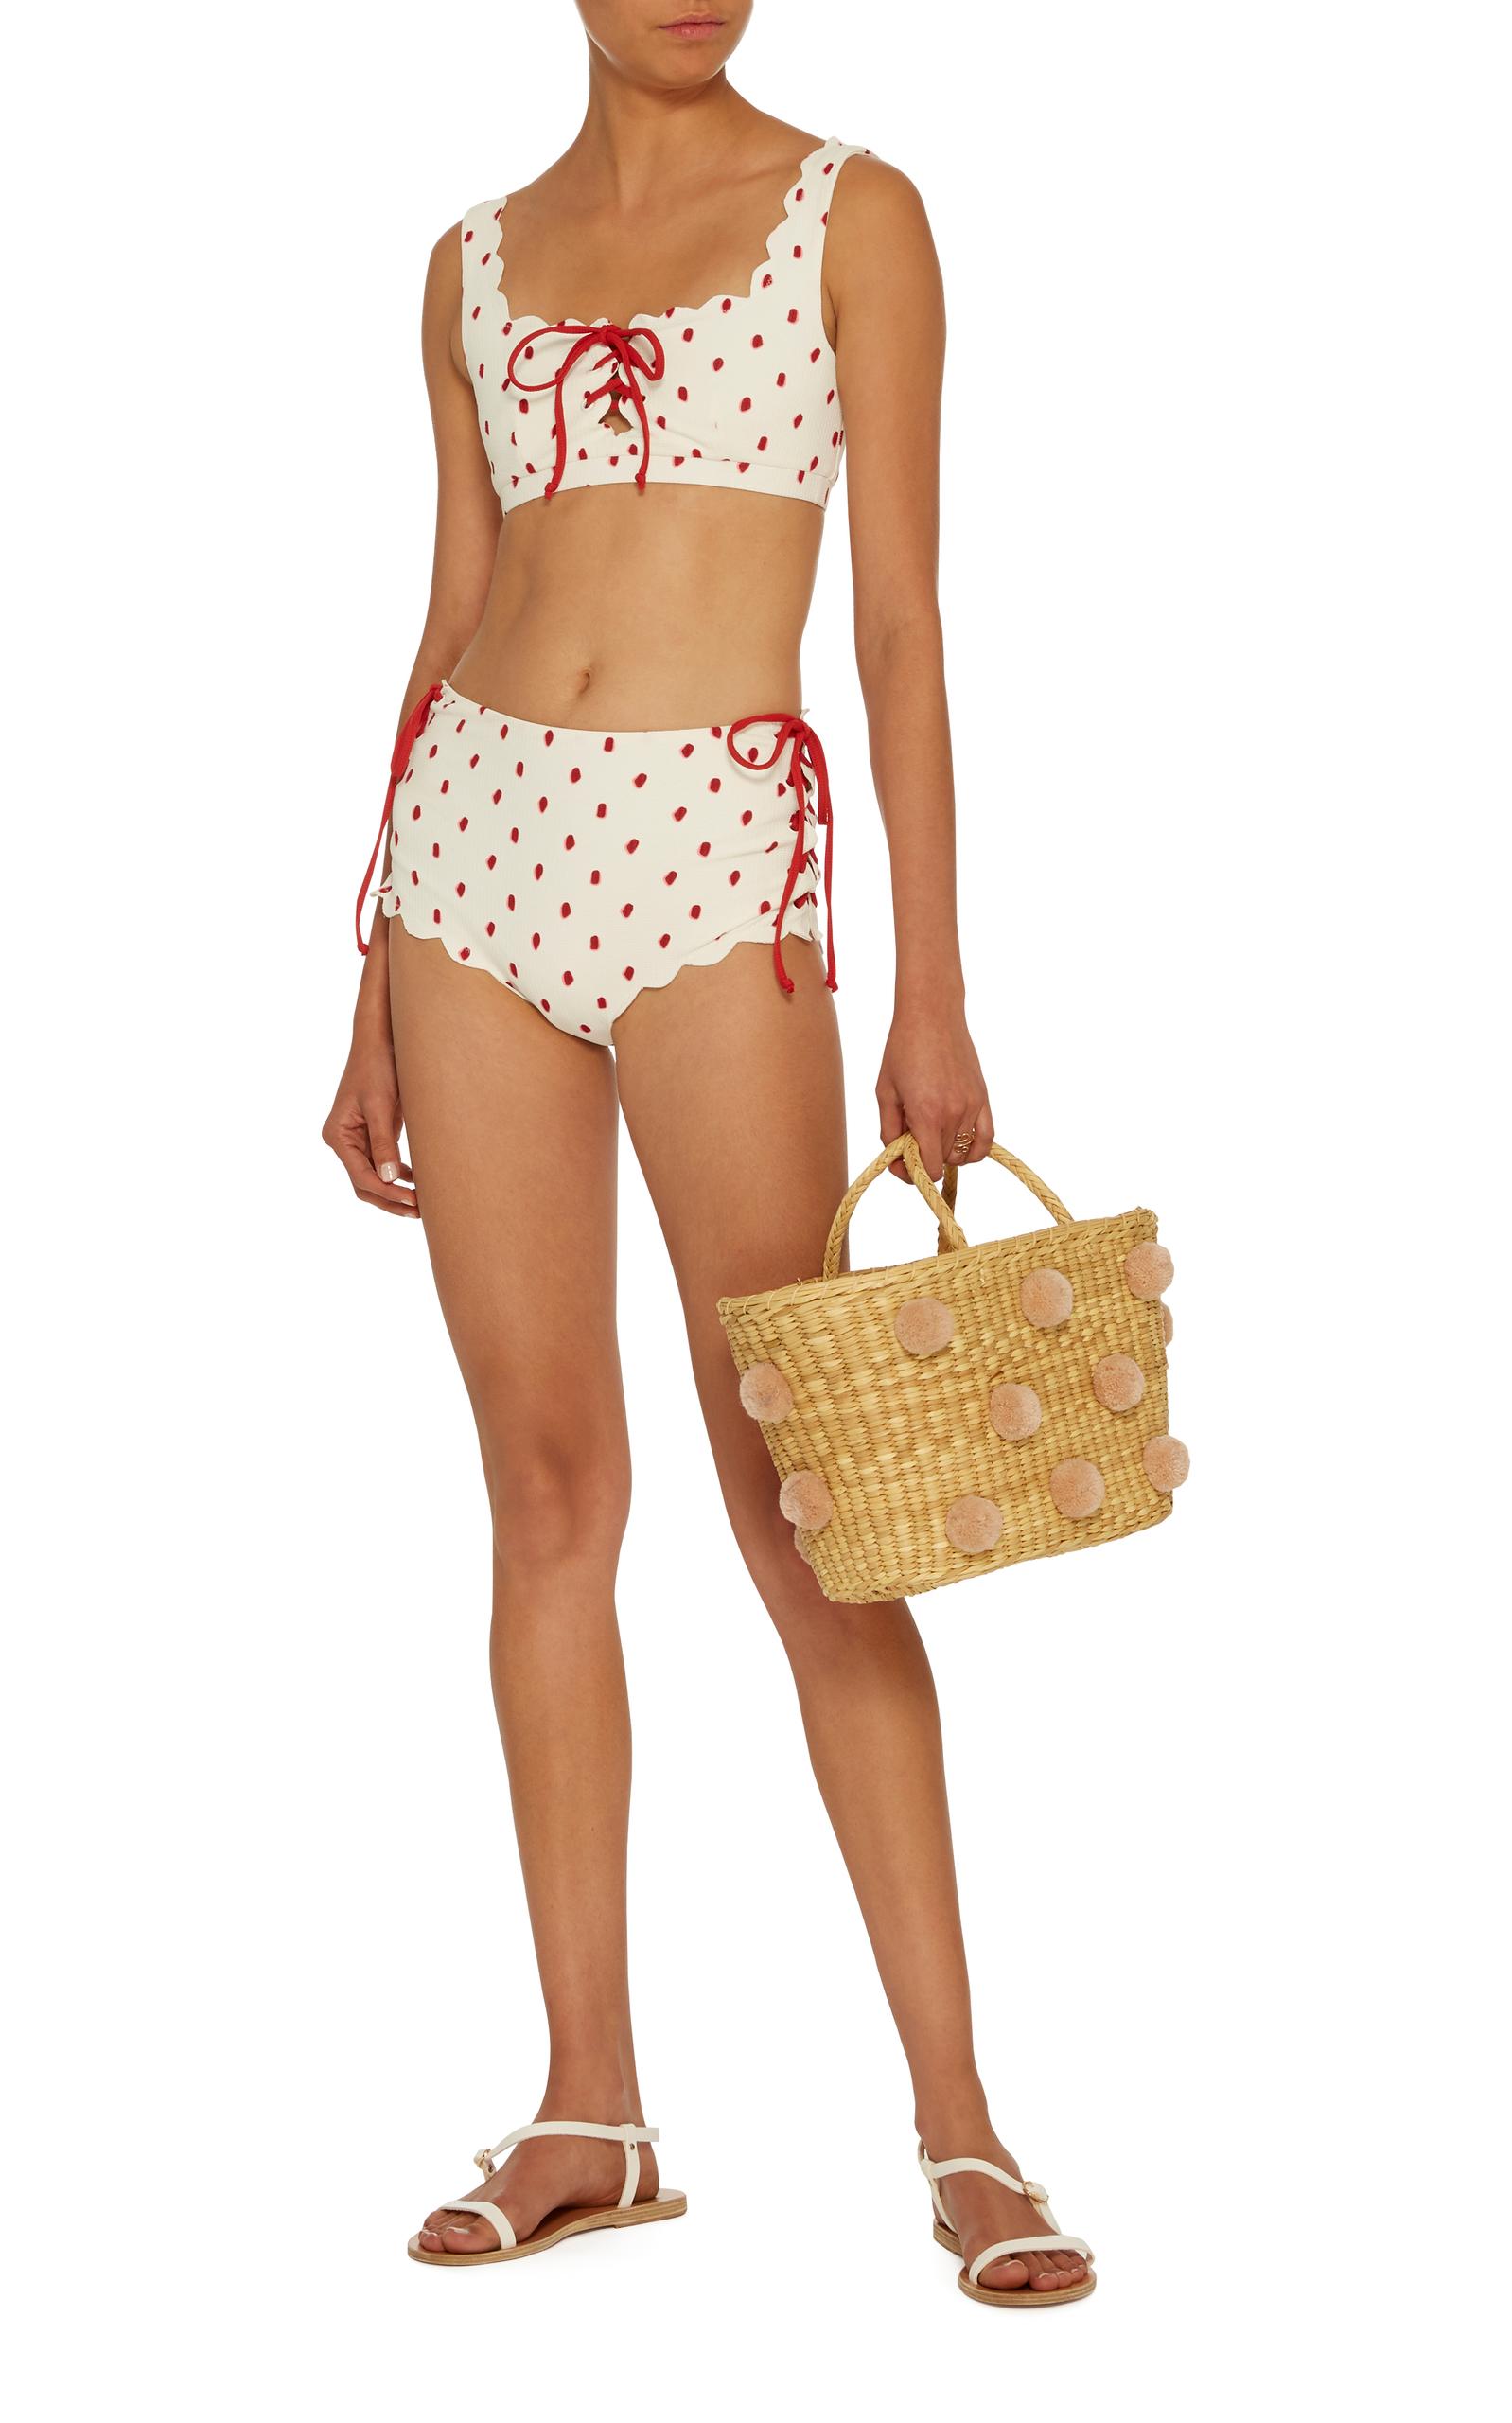 56d212b1295 Palm Springs Tie Bikini Top by Marysia Swim | Moda Operandi